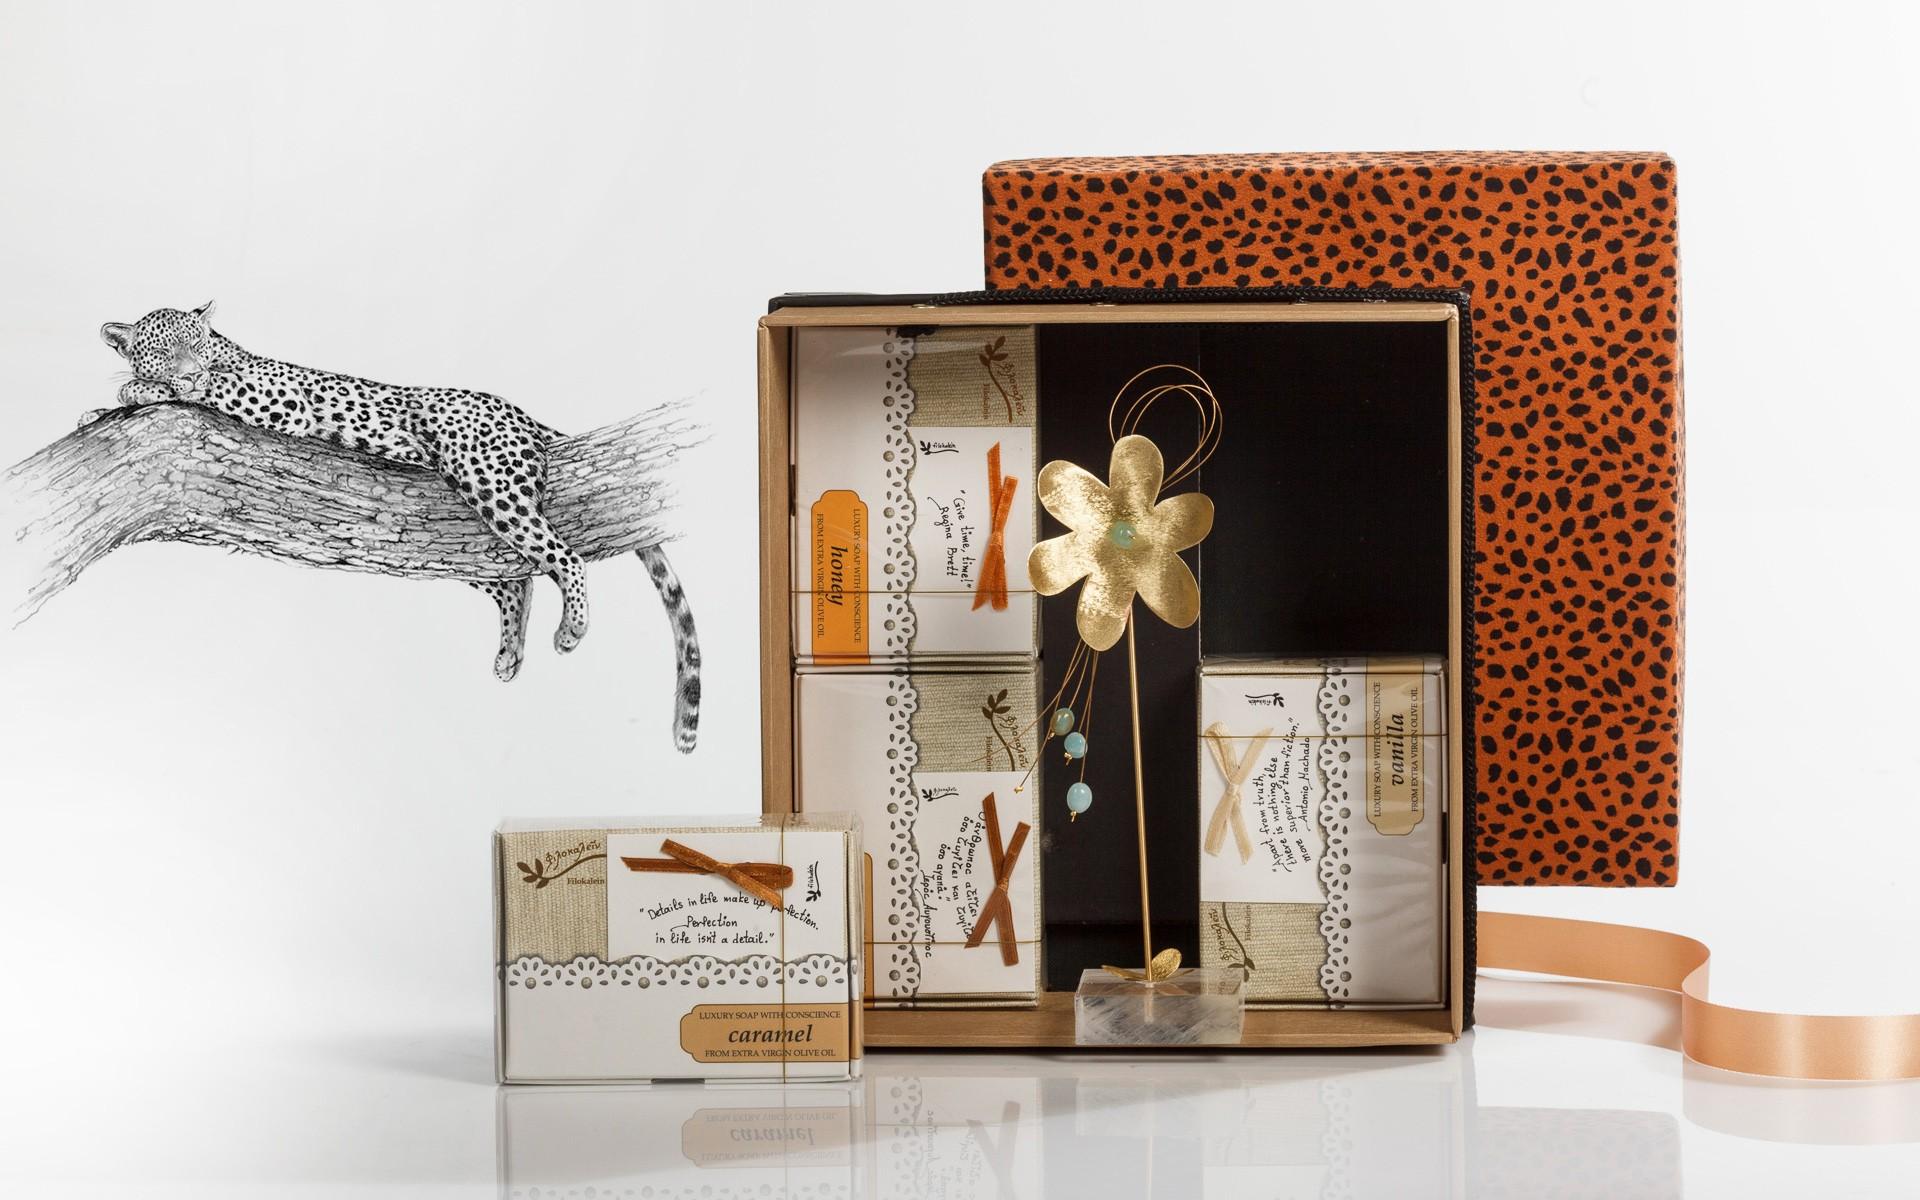 orange leopard - touching nature